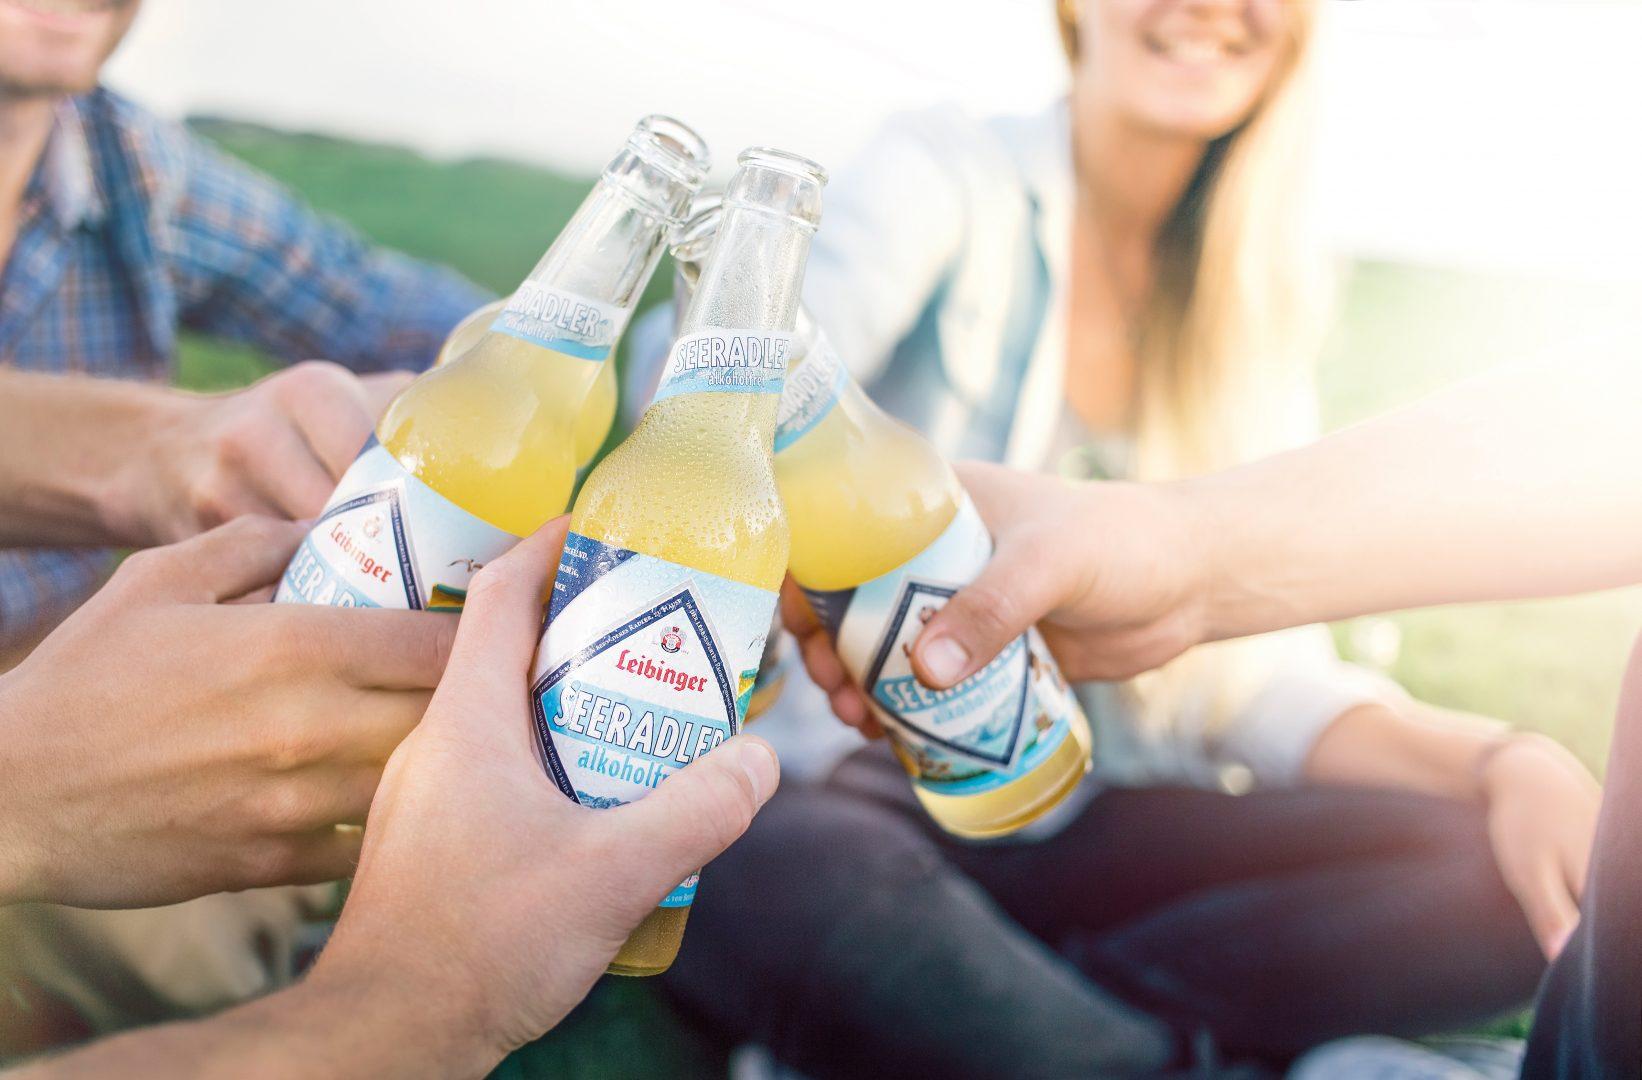 Leibinger Seeradler alkoholfrei anstoßen